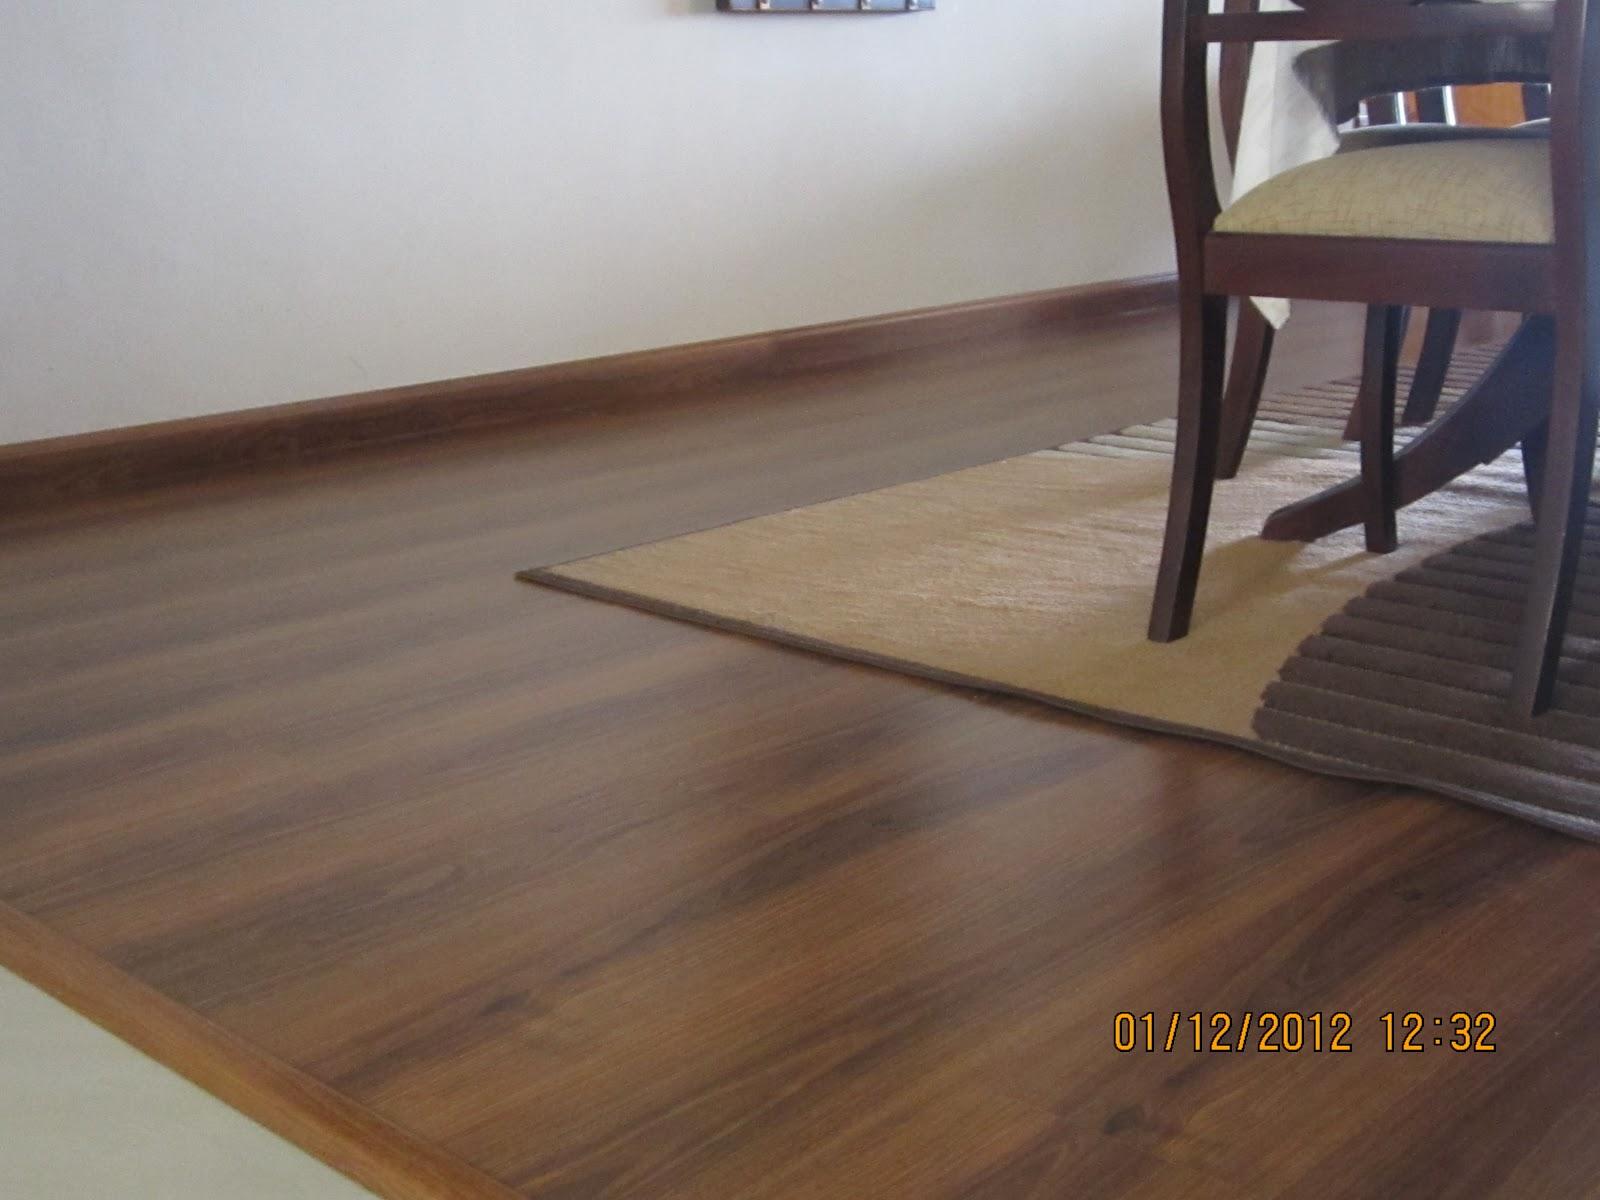 Dkor home c a pisos laminados - Laminados de madera ...